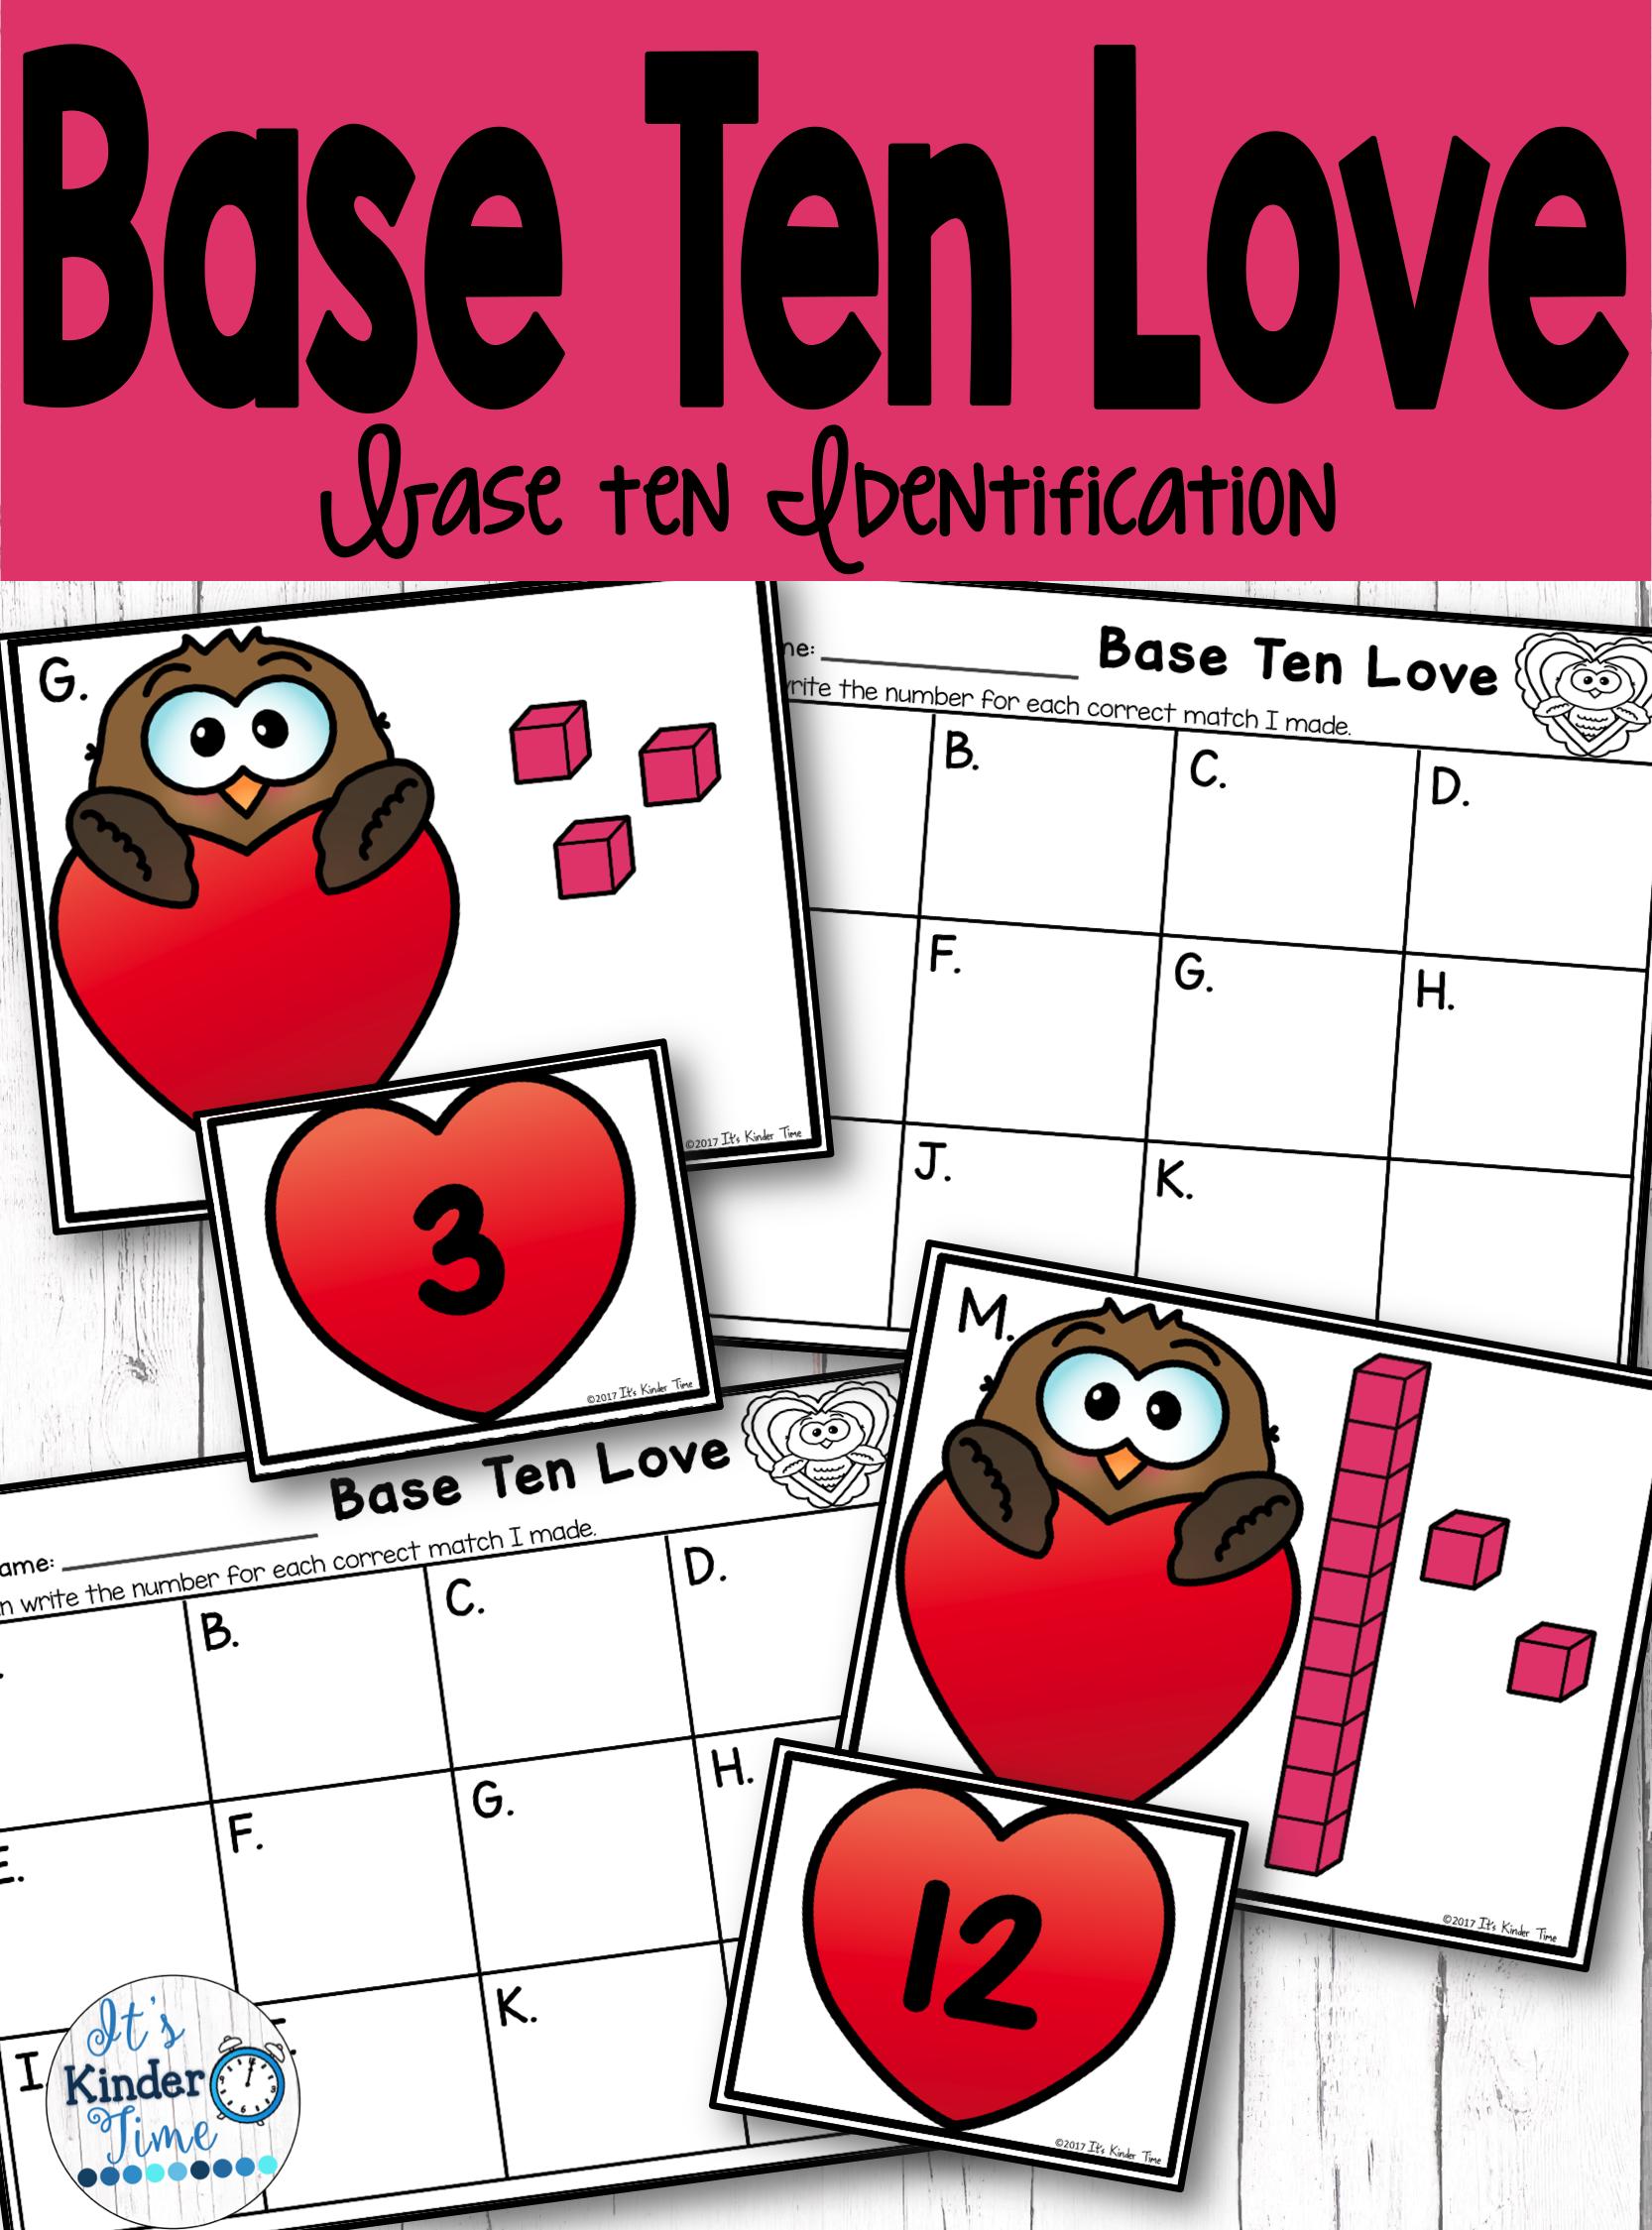 Base Ten Love